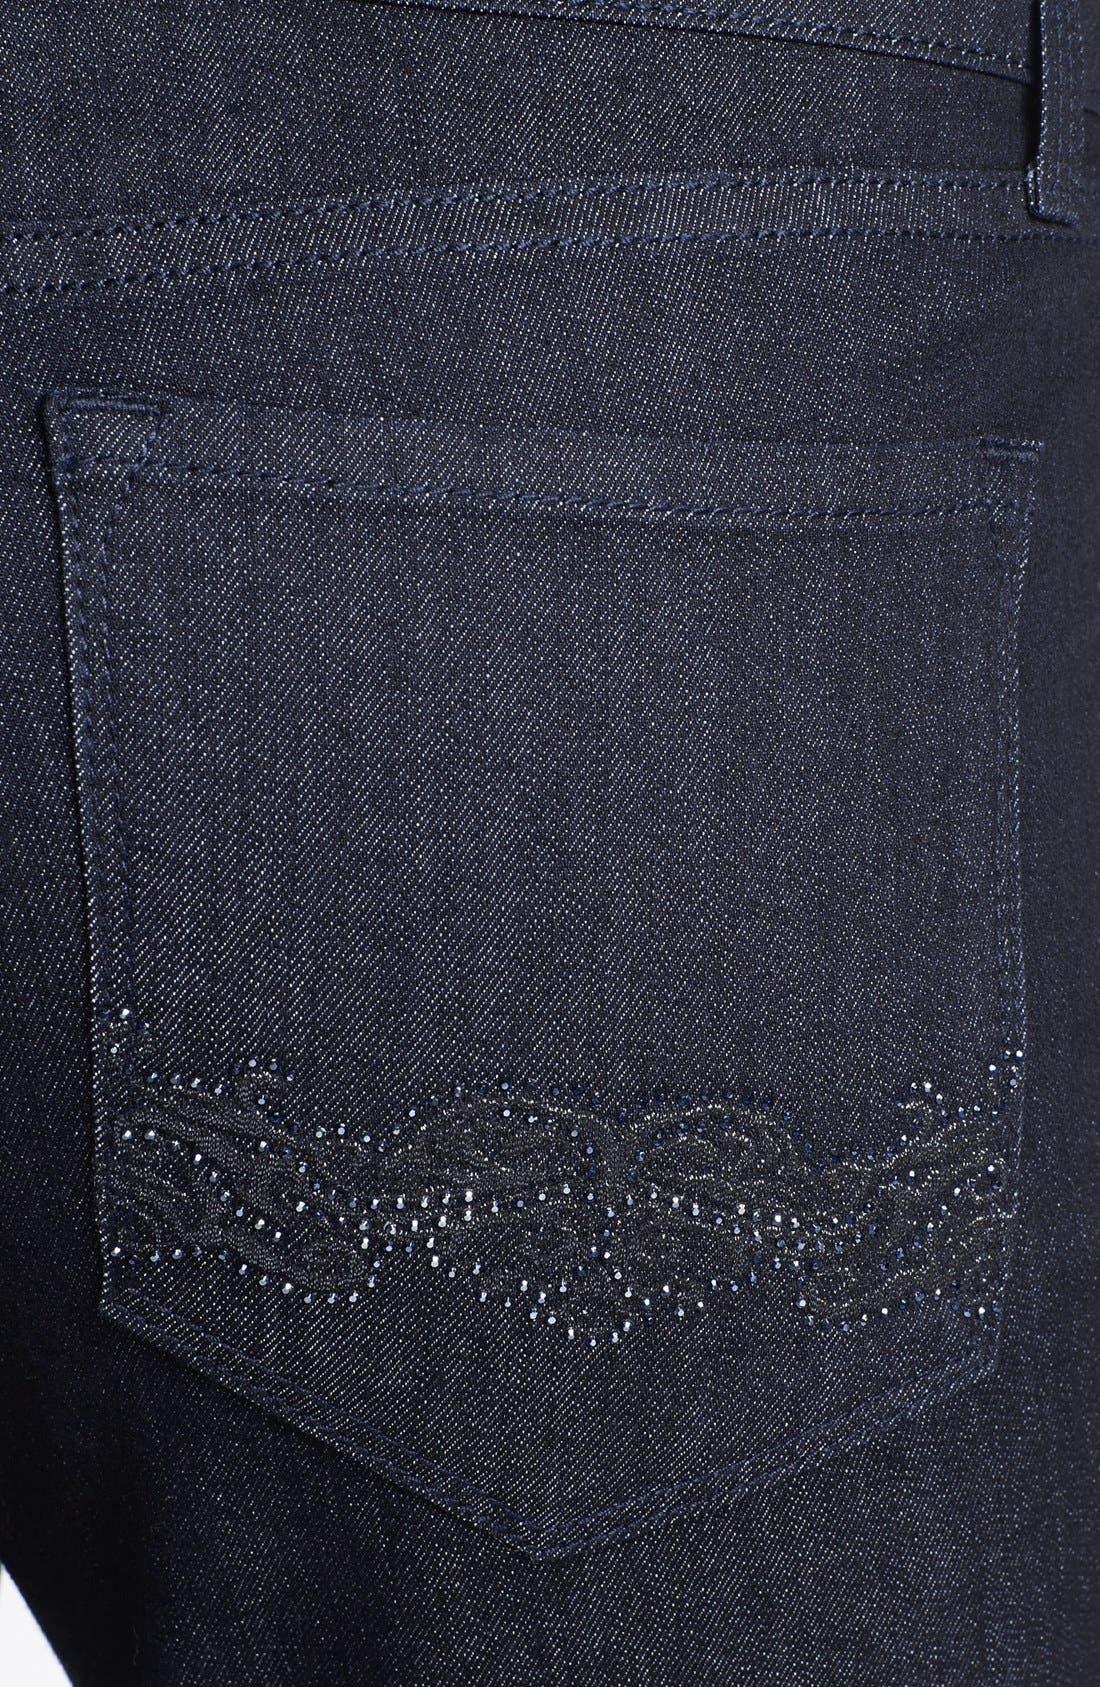 Alternate Image 3  - NYDJ 'Barbara' Embellished Bootcut Jeans (Dark Enzyme) (Regular & Petite)